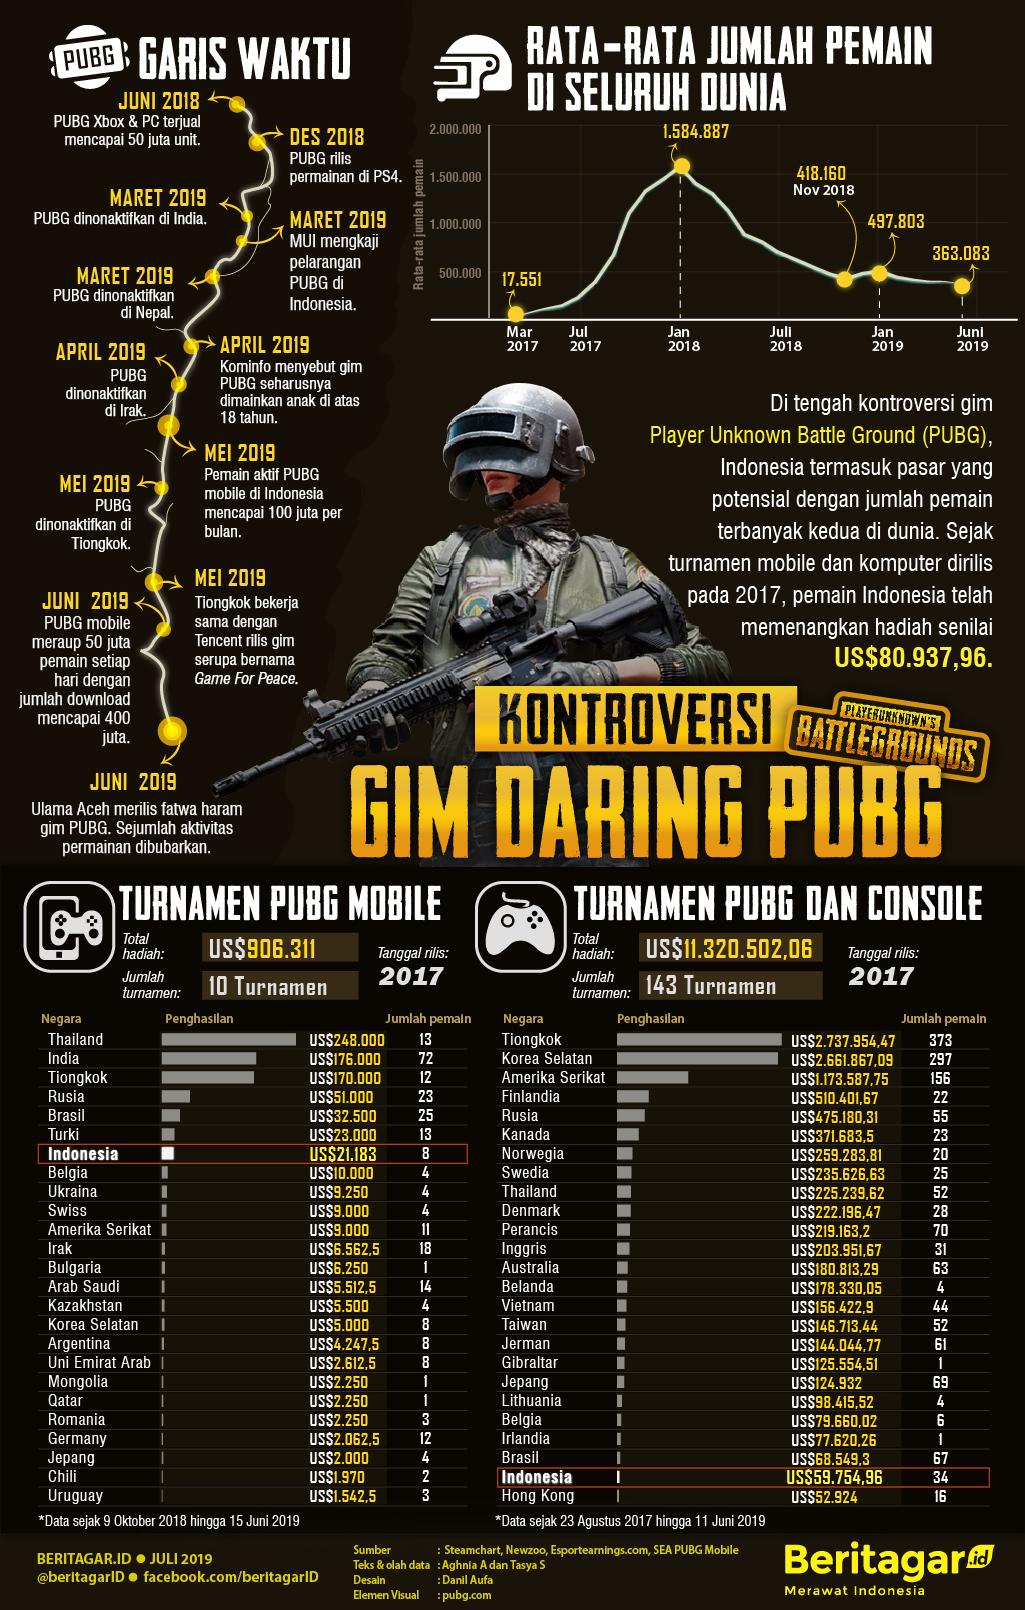 Infografis Kotroversi Gim Daring PUBG